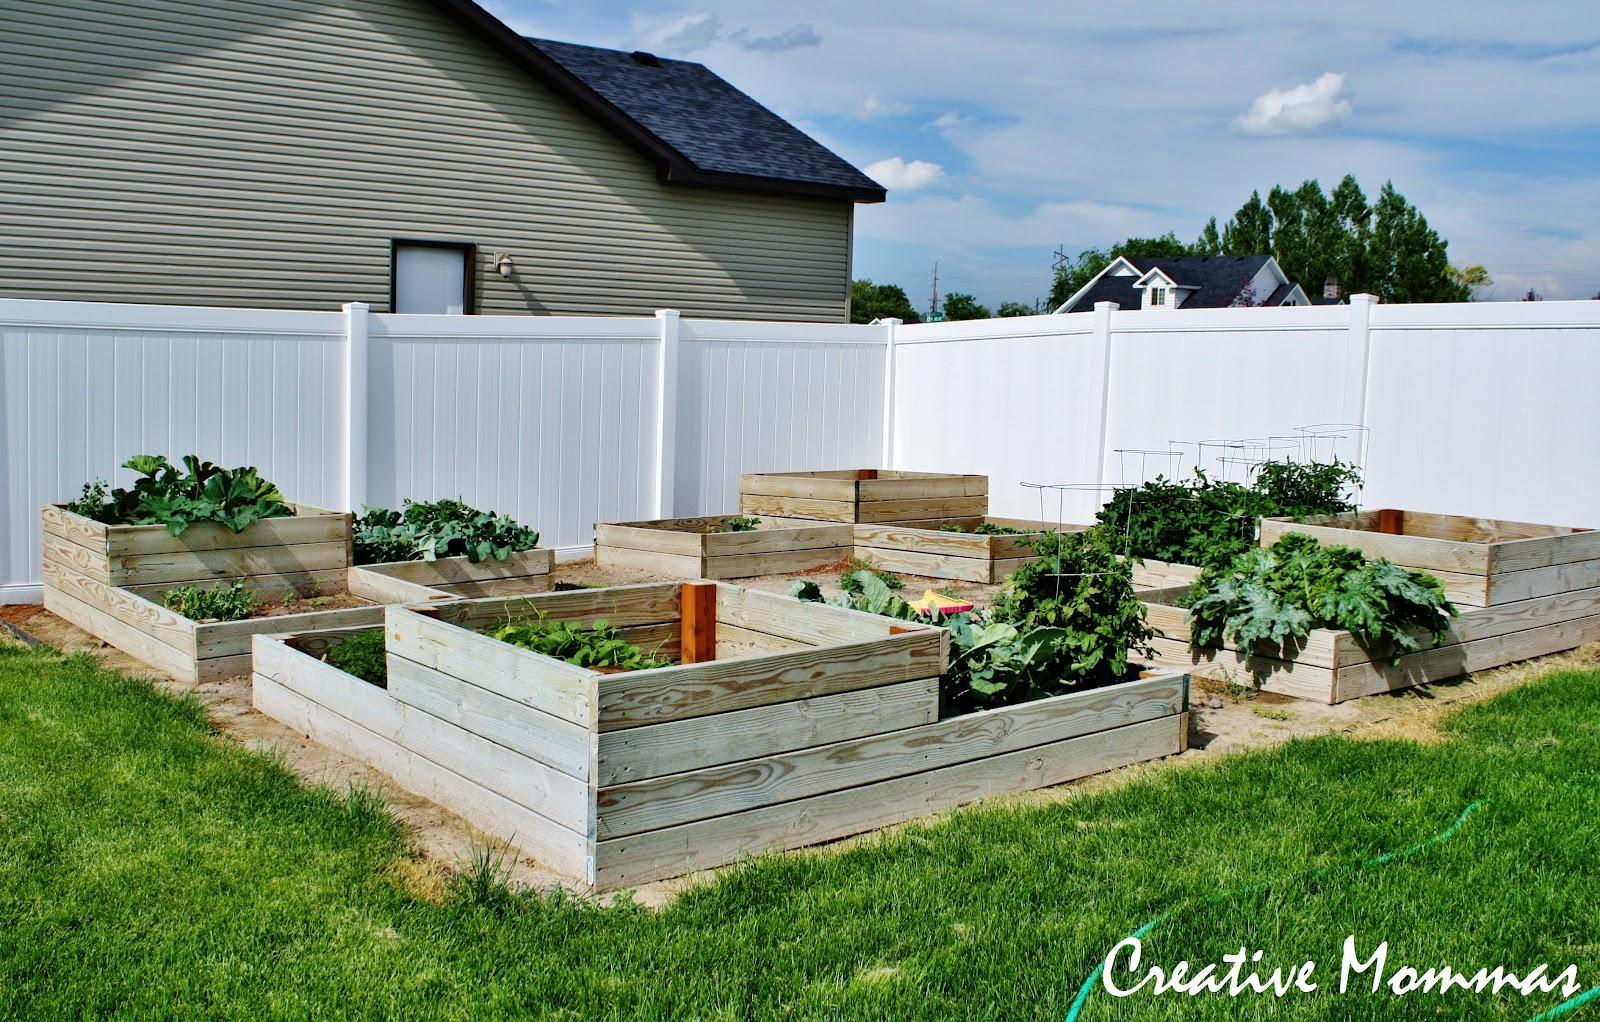 Creative Mommas: DIY Tiered Raised Garden Beds